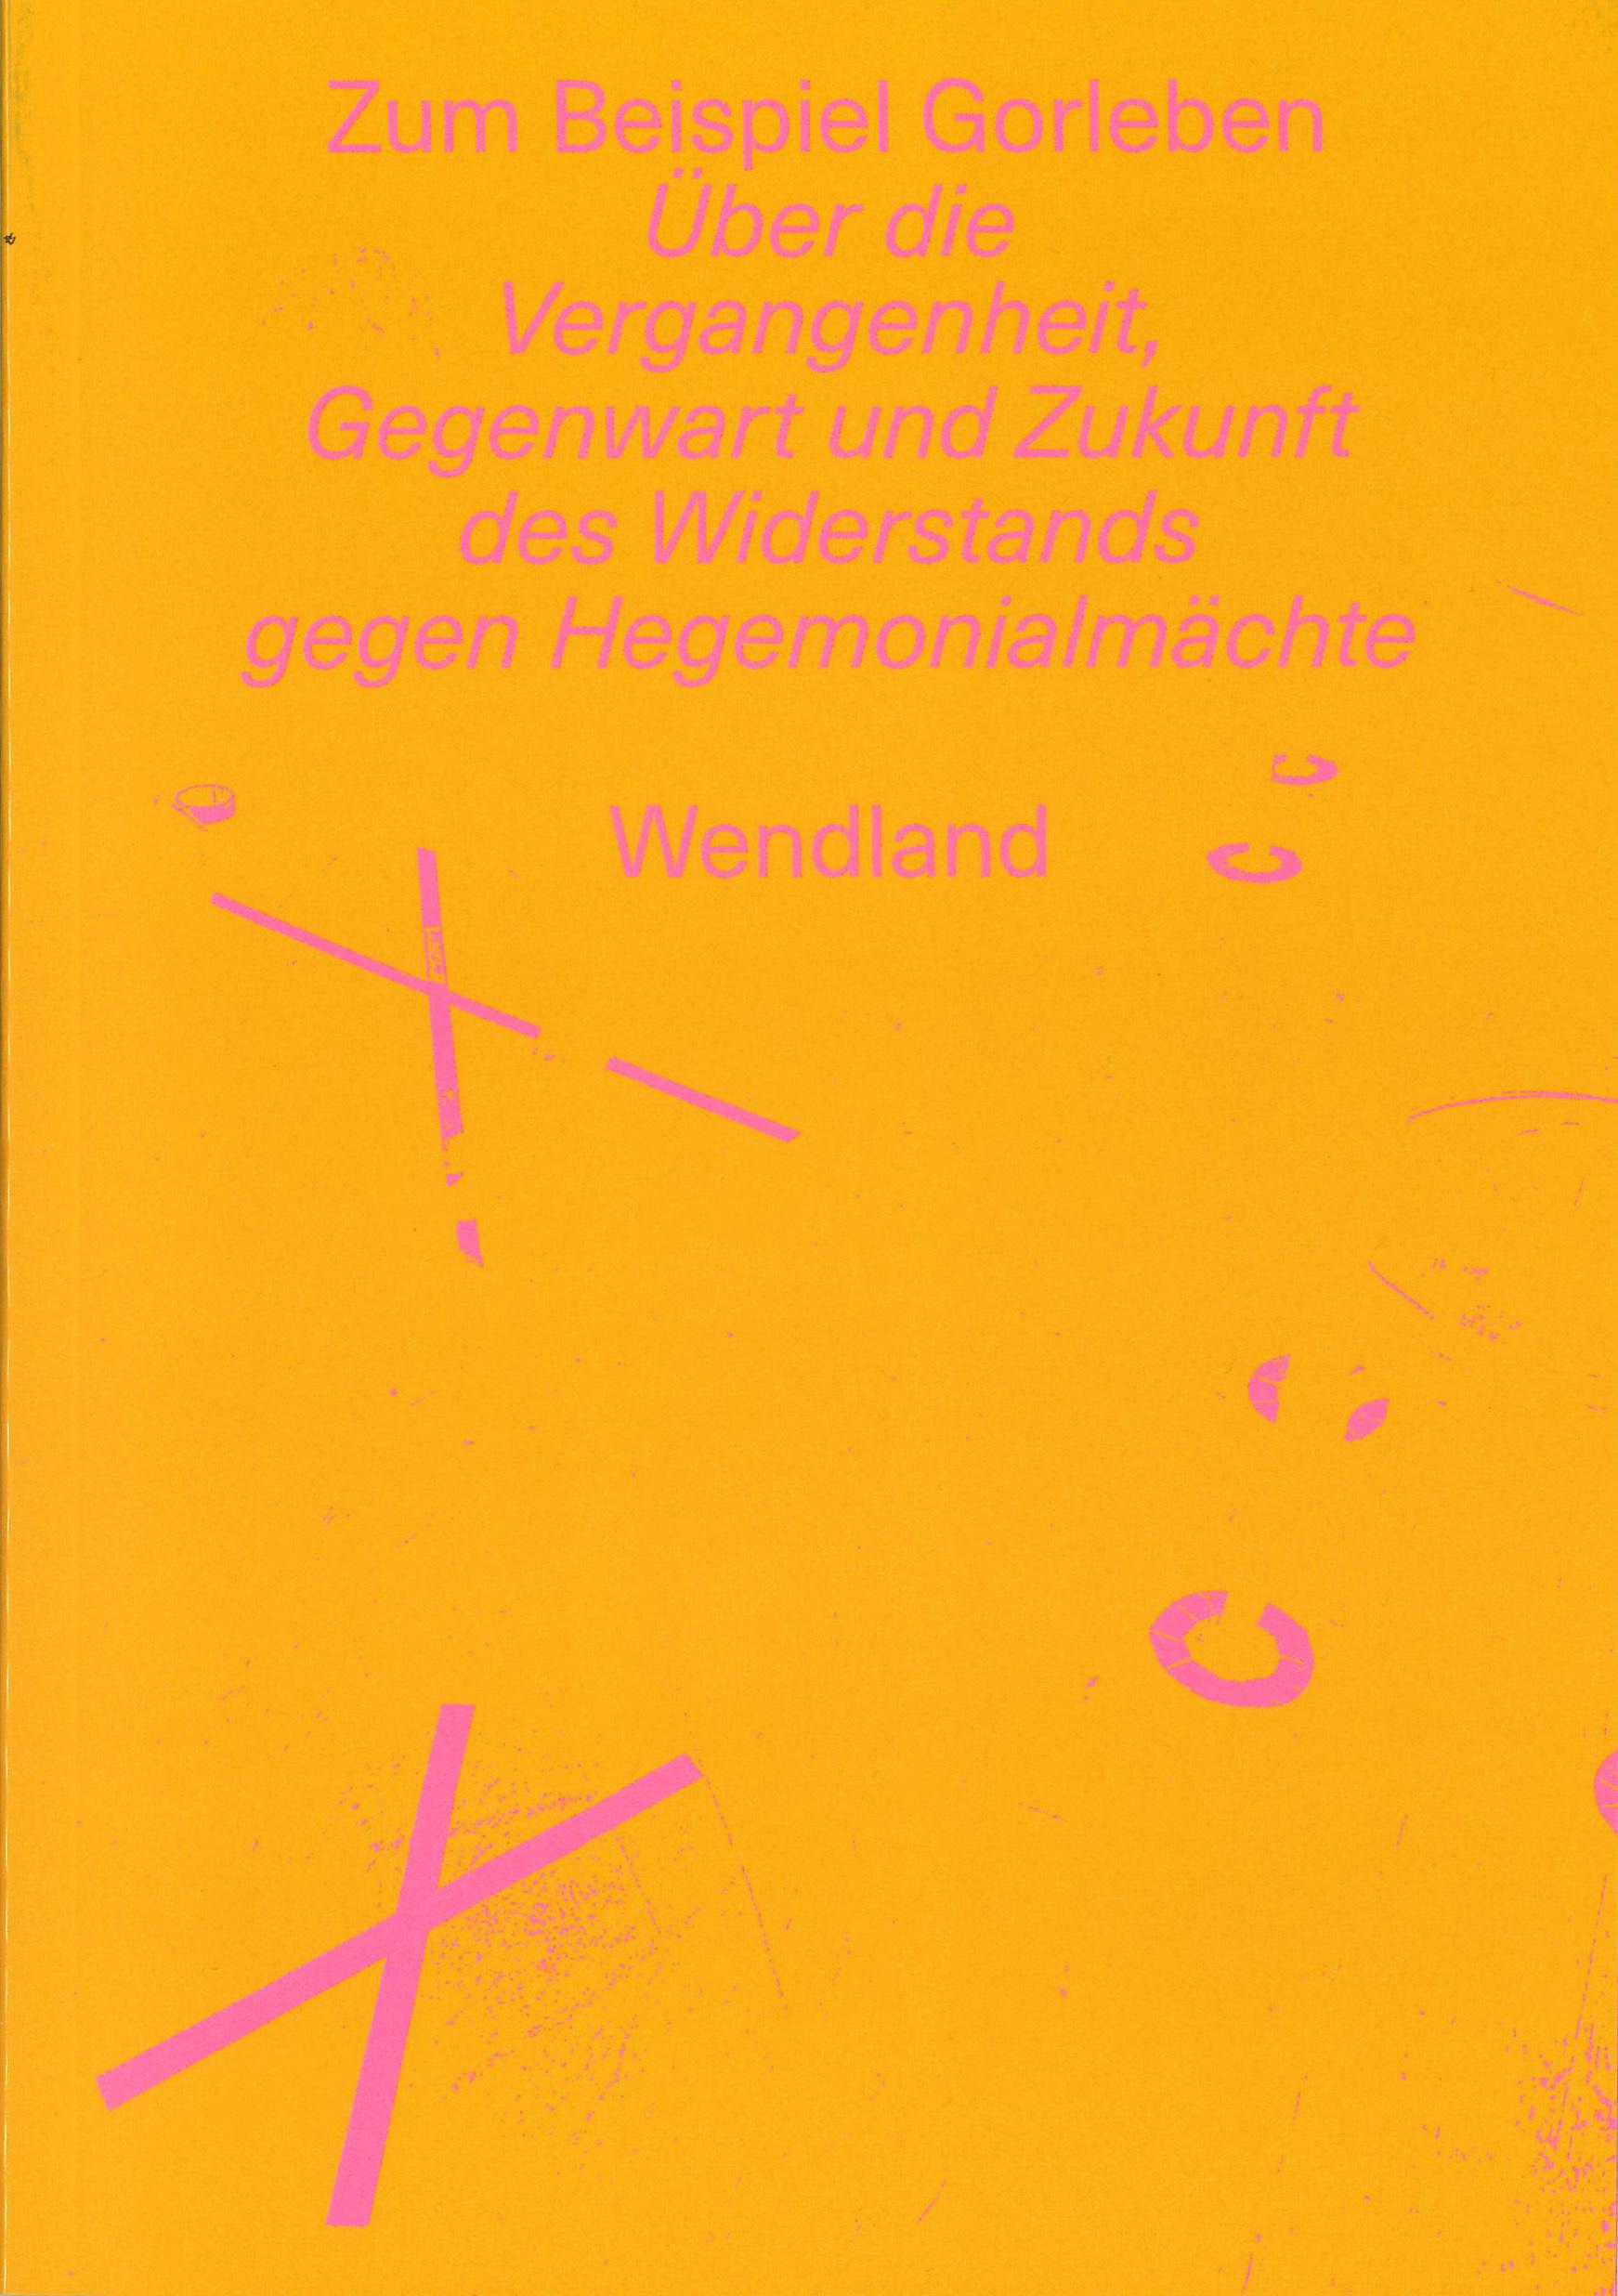 2020 Wendland